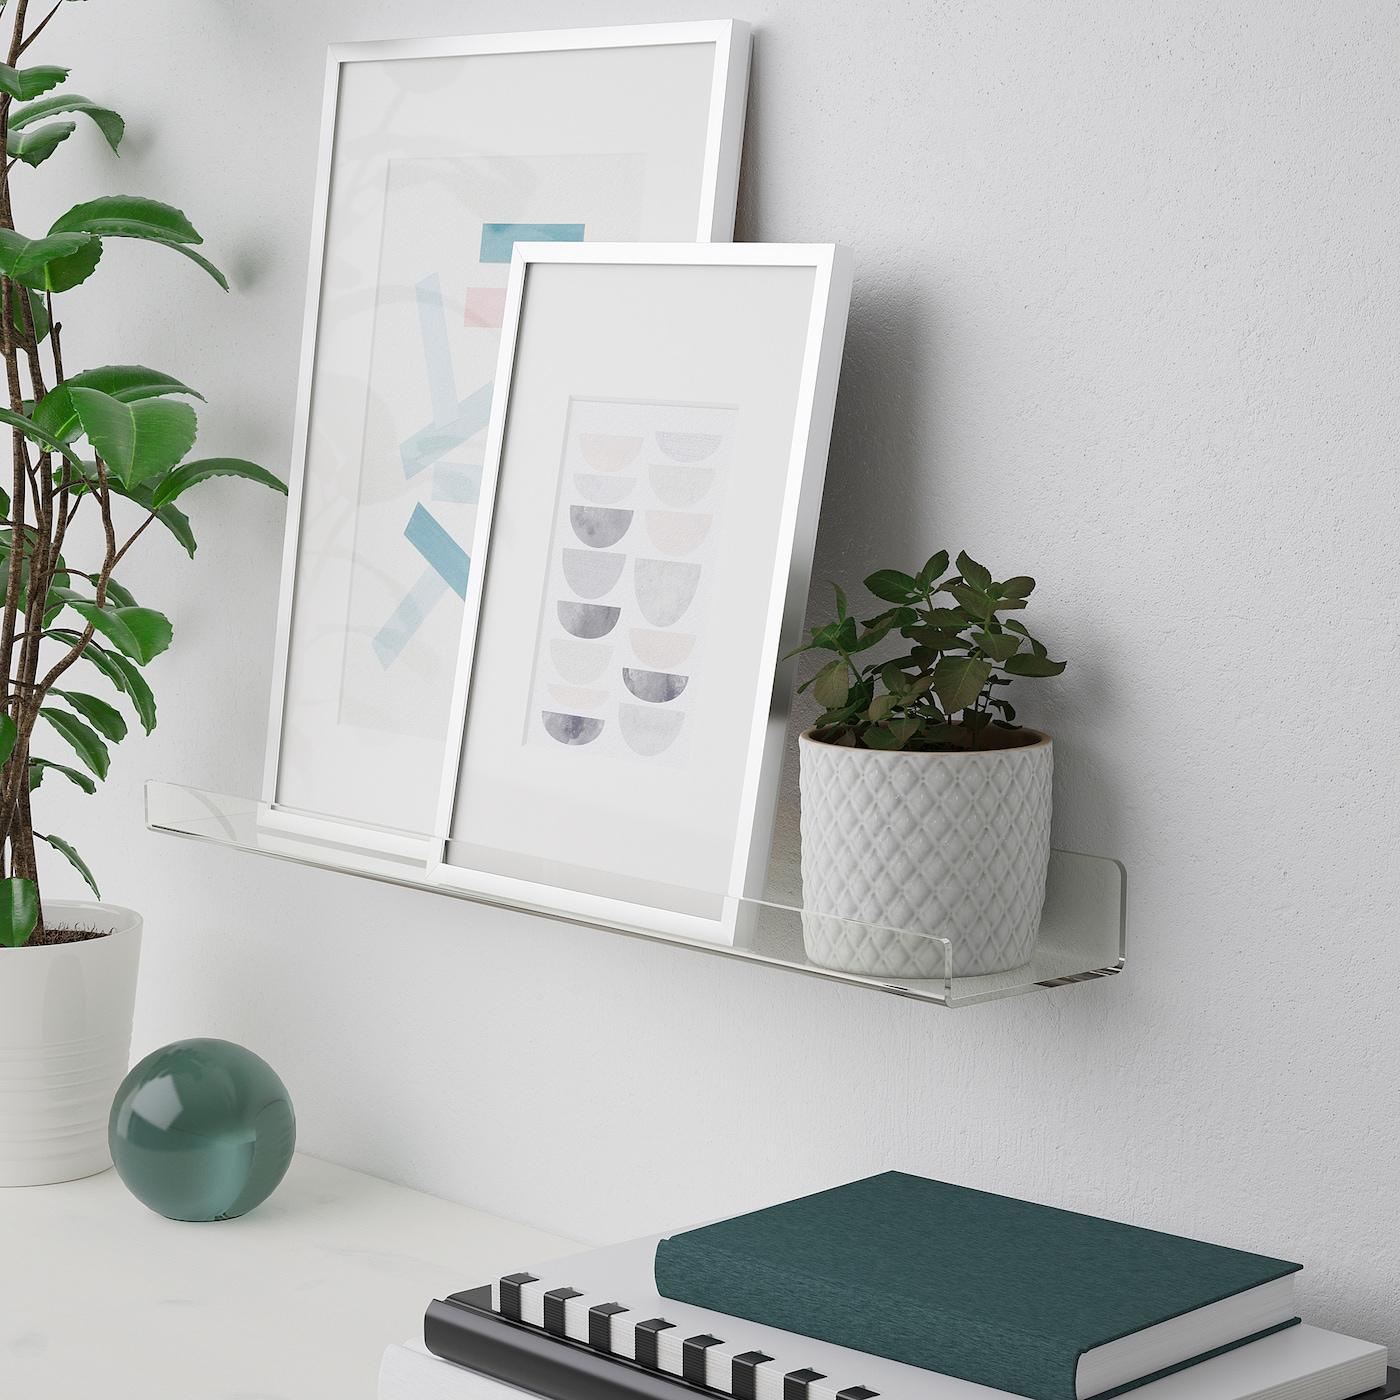 IKEA MALERAS Bilderleiste aus Bambus; Fotoleiste Holzleiste Dekoration 75cm